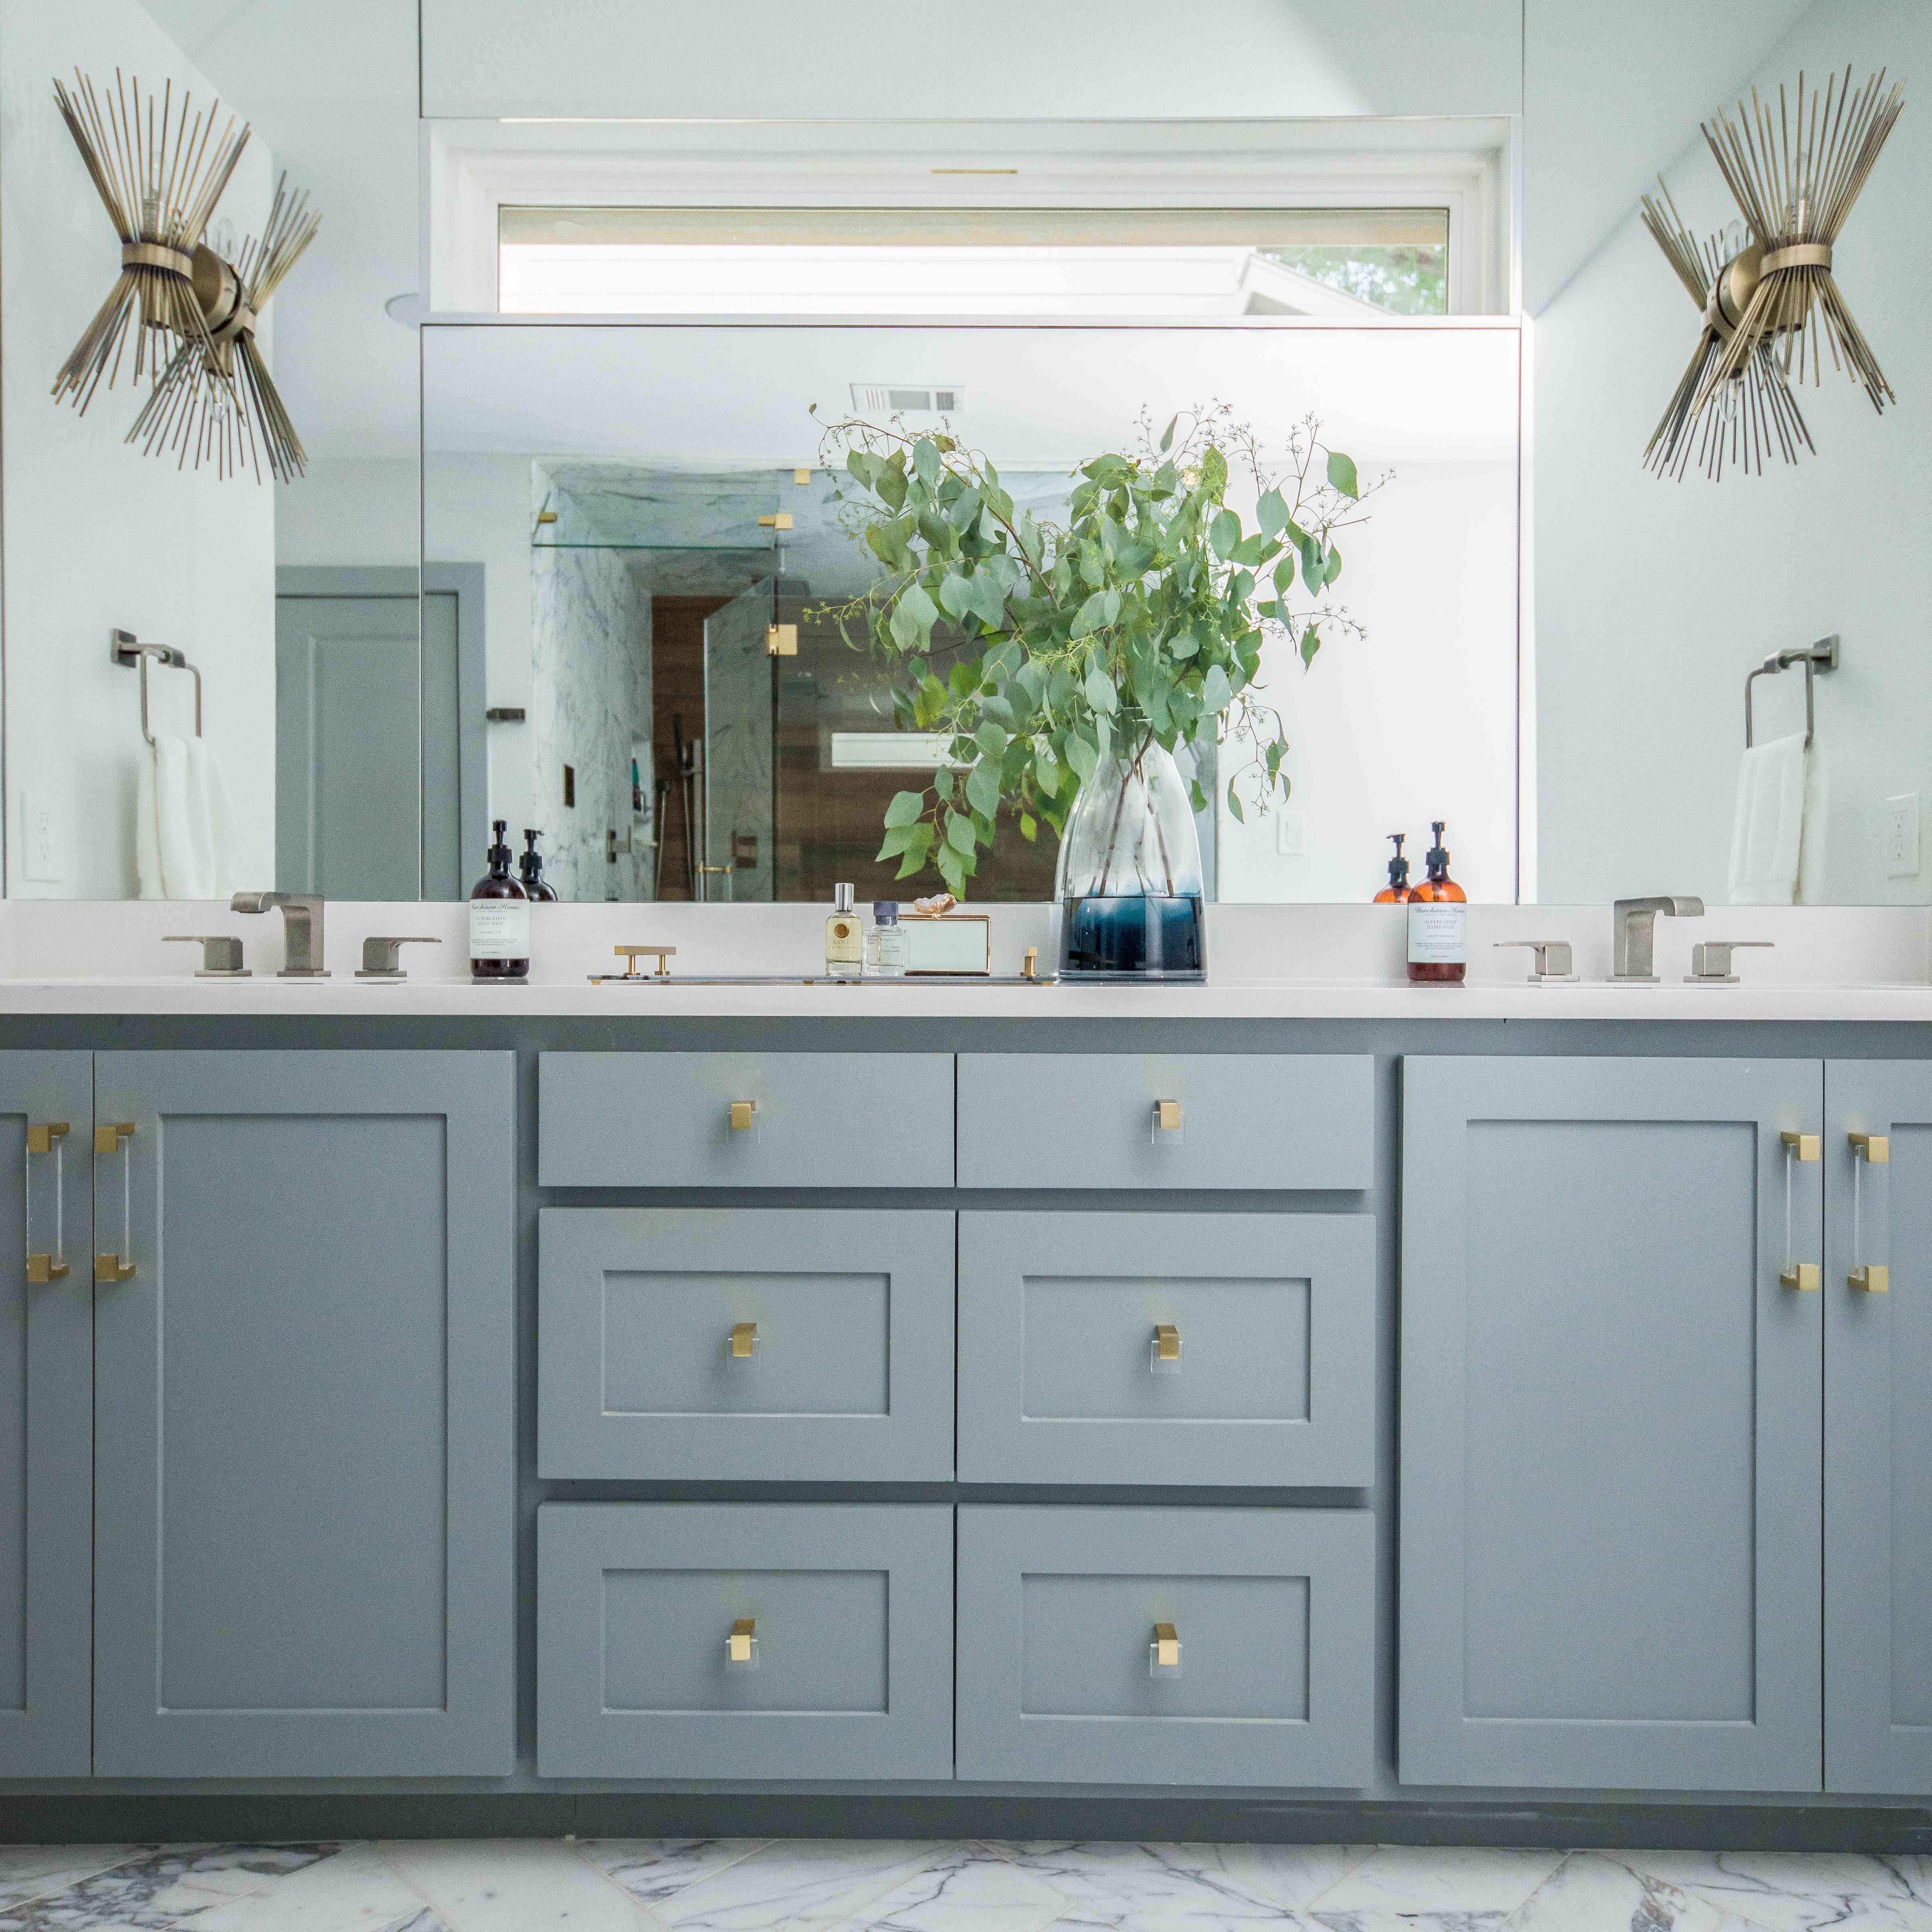 18 Bathroom Flooring Ideas To Inspire Your Next Remodel